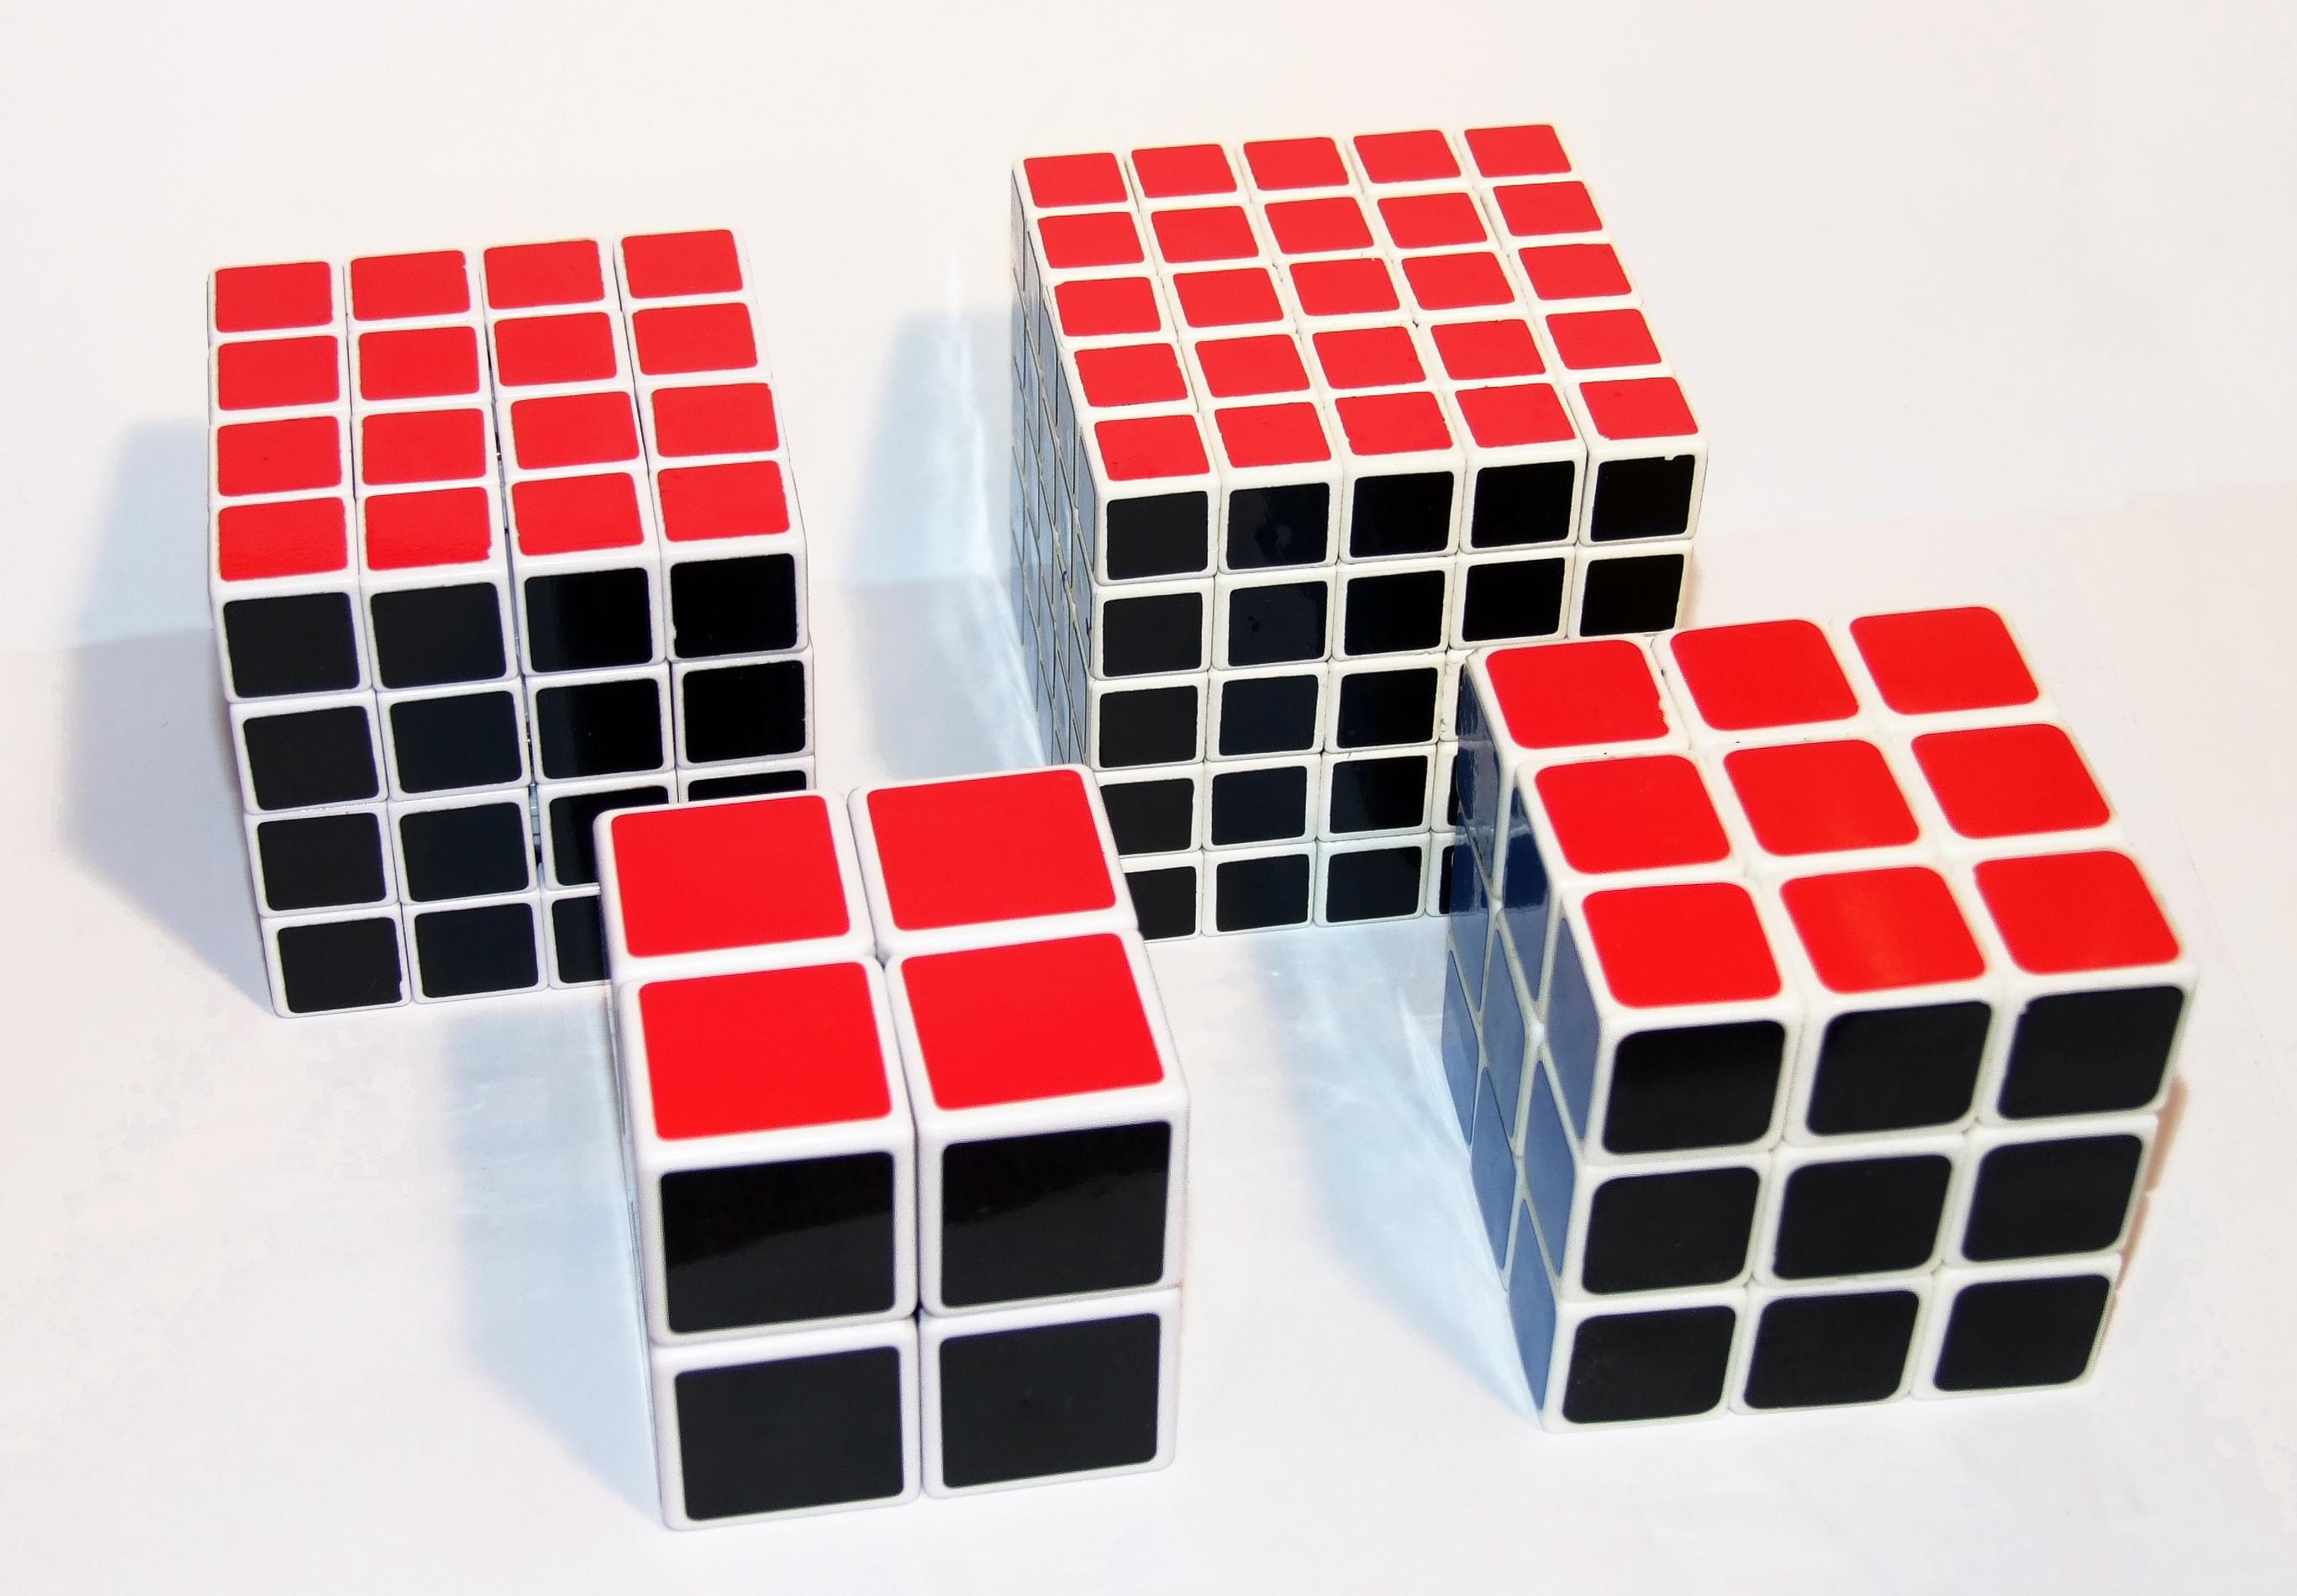 rubik cube solution pdf download malayalam